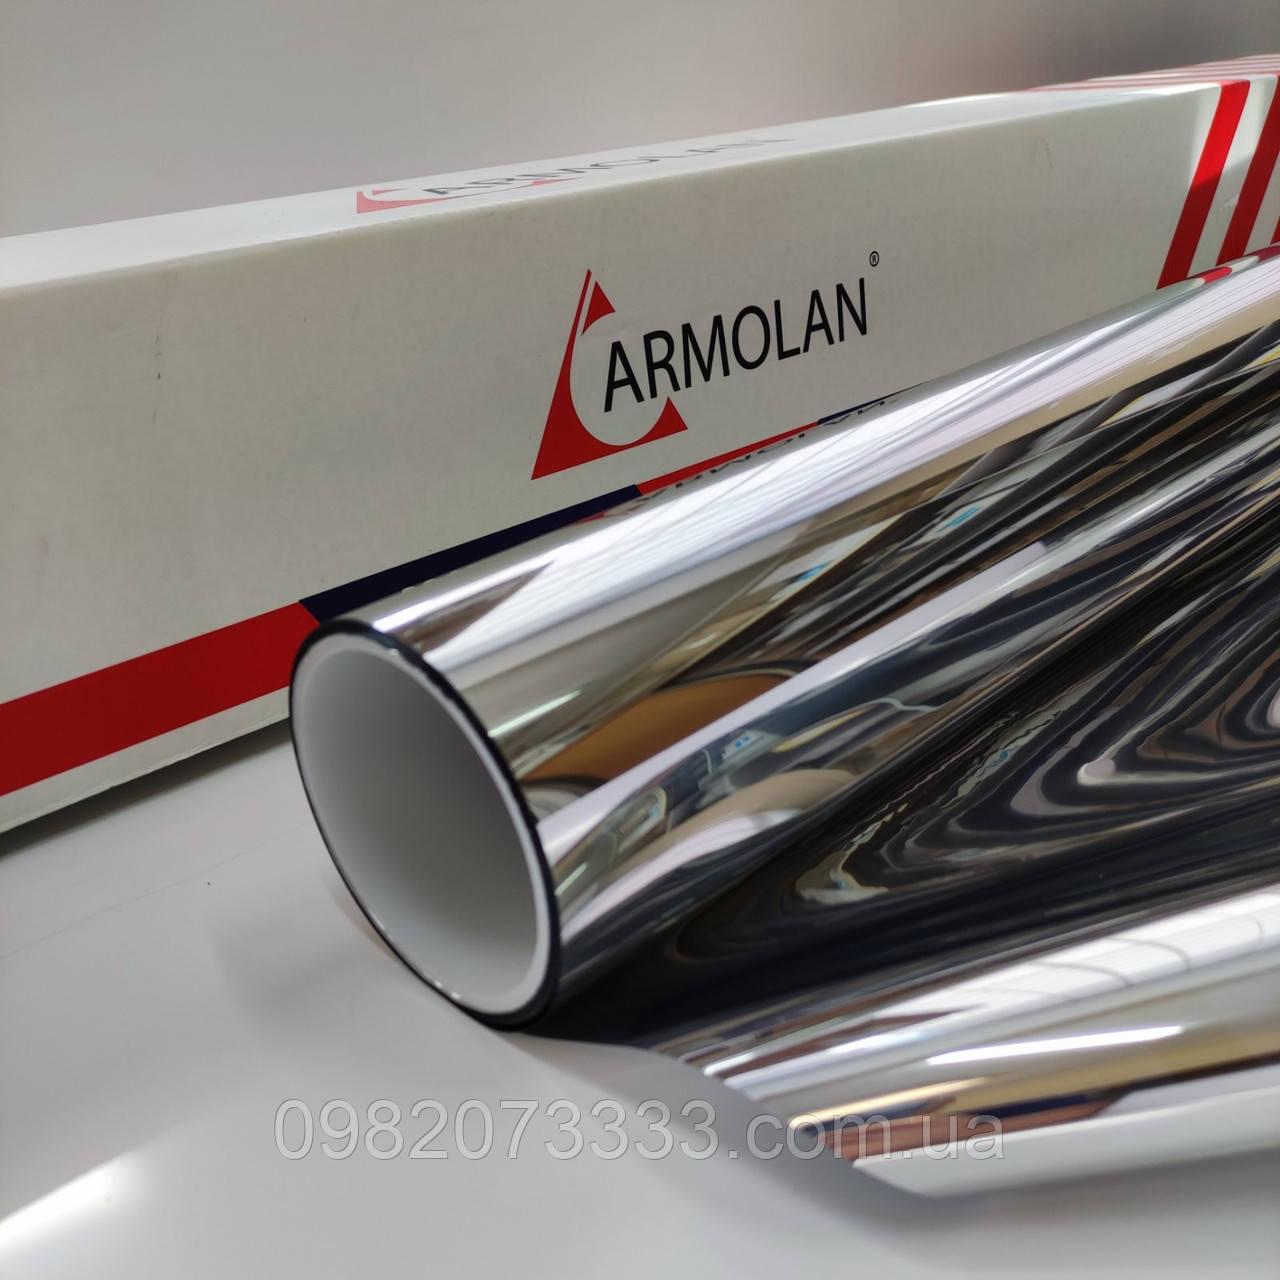 Солнцезащитная плёнка Armolan Silver 15% USA зеркальная для тонировки окон. Цена за размер 150х100см.